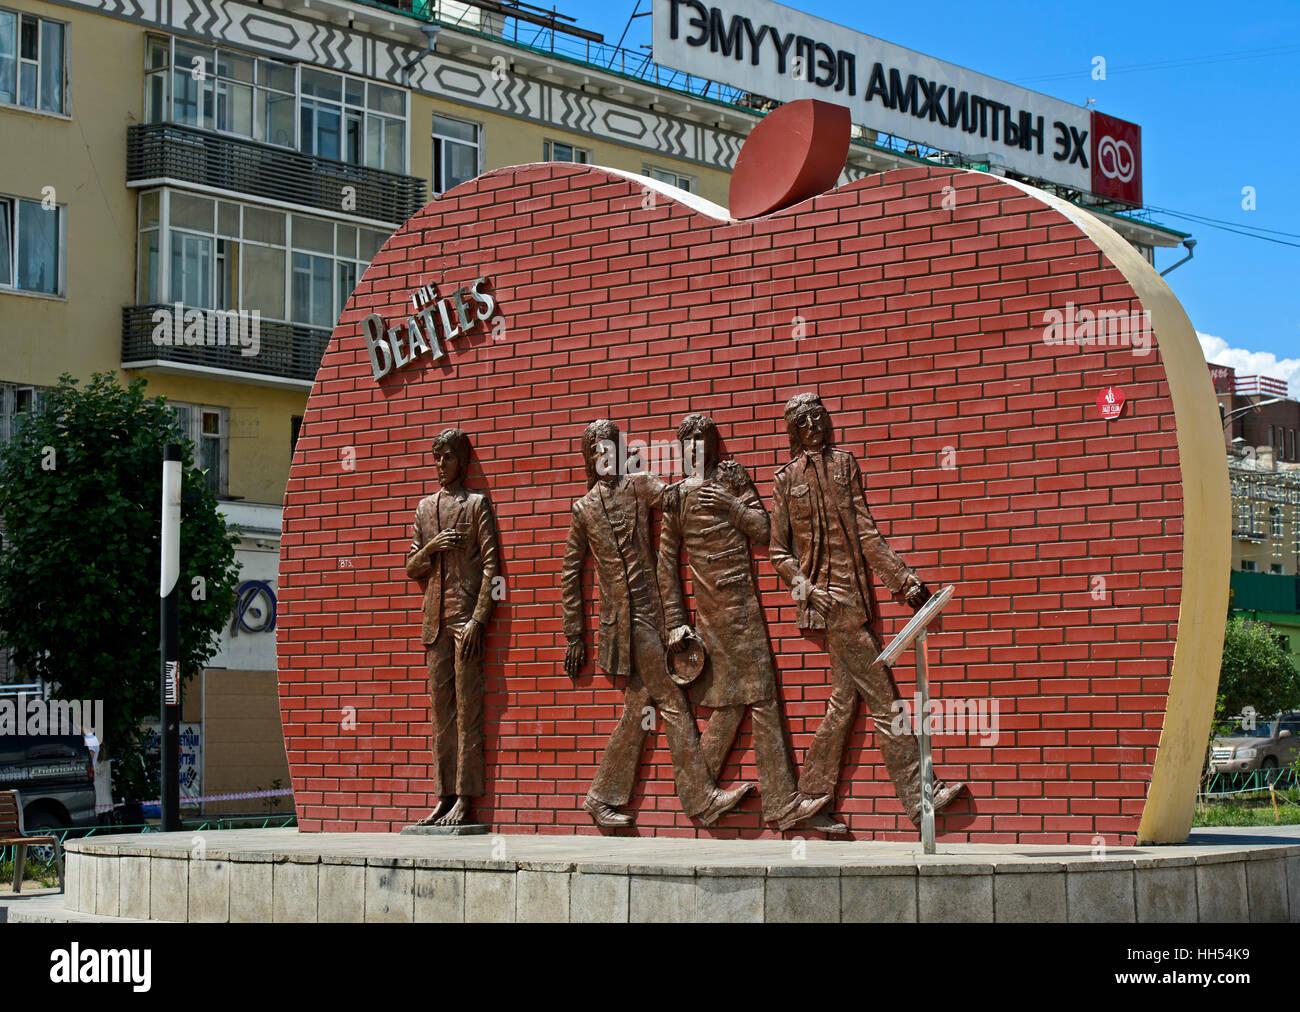 The Beatles monument, Sukhbaatar District, Ulaanbaatar, Mongolia - Stock Image